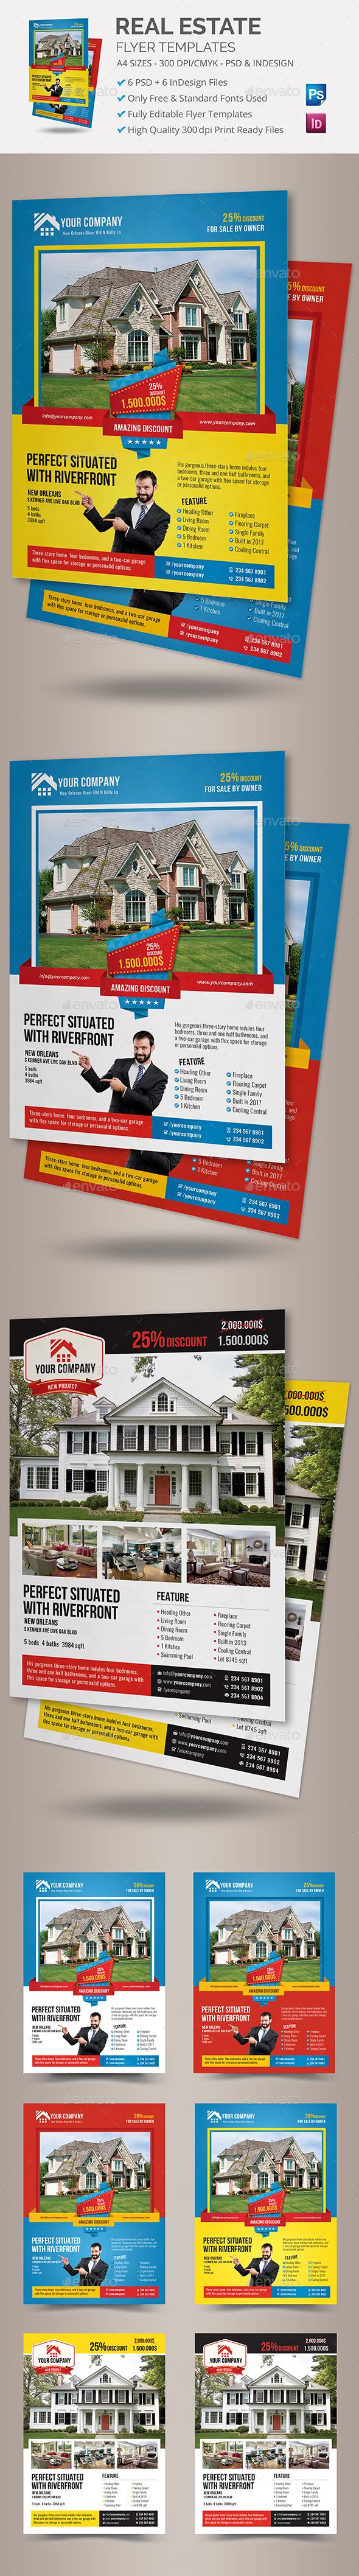 Real Estate Flyer Vol 02 - Commerce Flyers